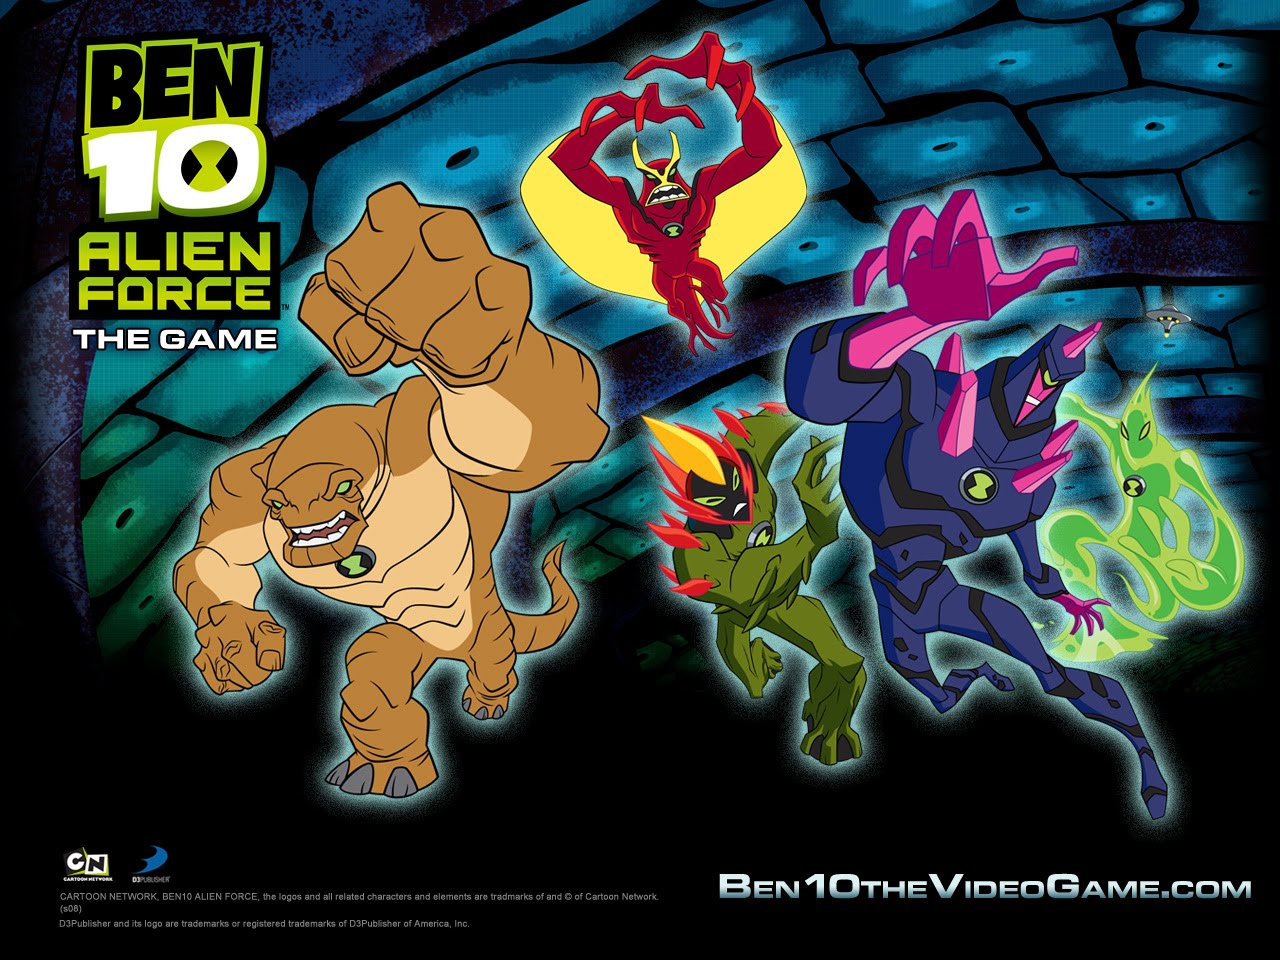 http://1.bp.blogspot.com/_1AahBY9IEXU/TDN5NIWnixI/AAAAAAAAAFk/GumRhJHnDVA/s1600/Ben-10-The-Video-Game-1.jpg